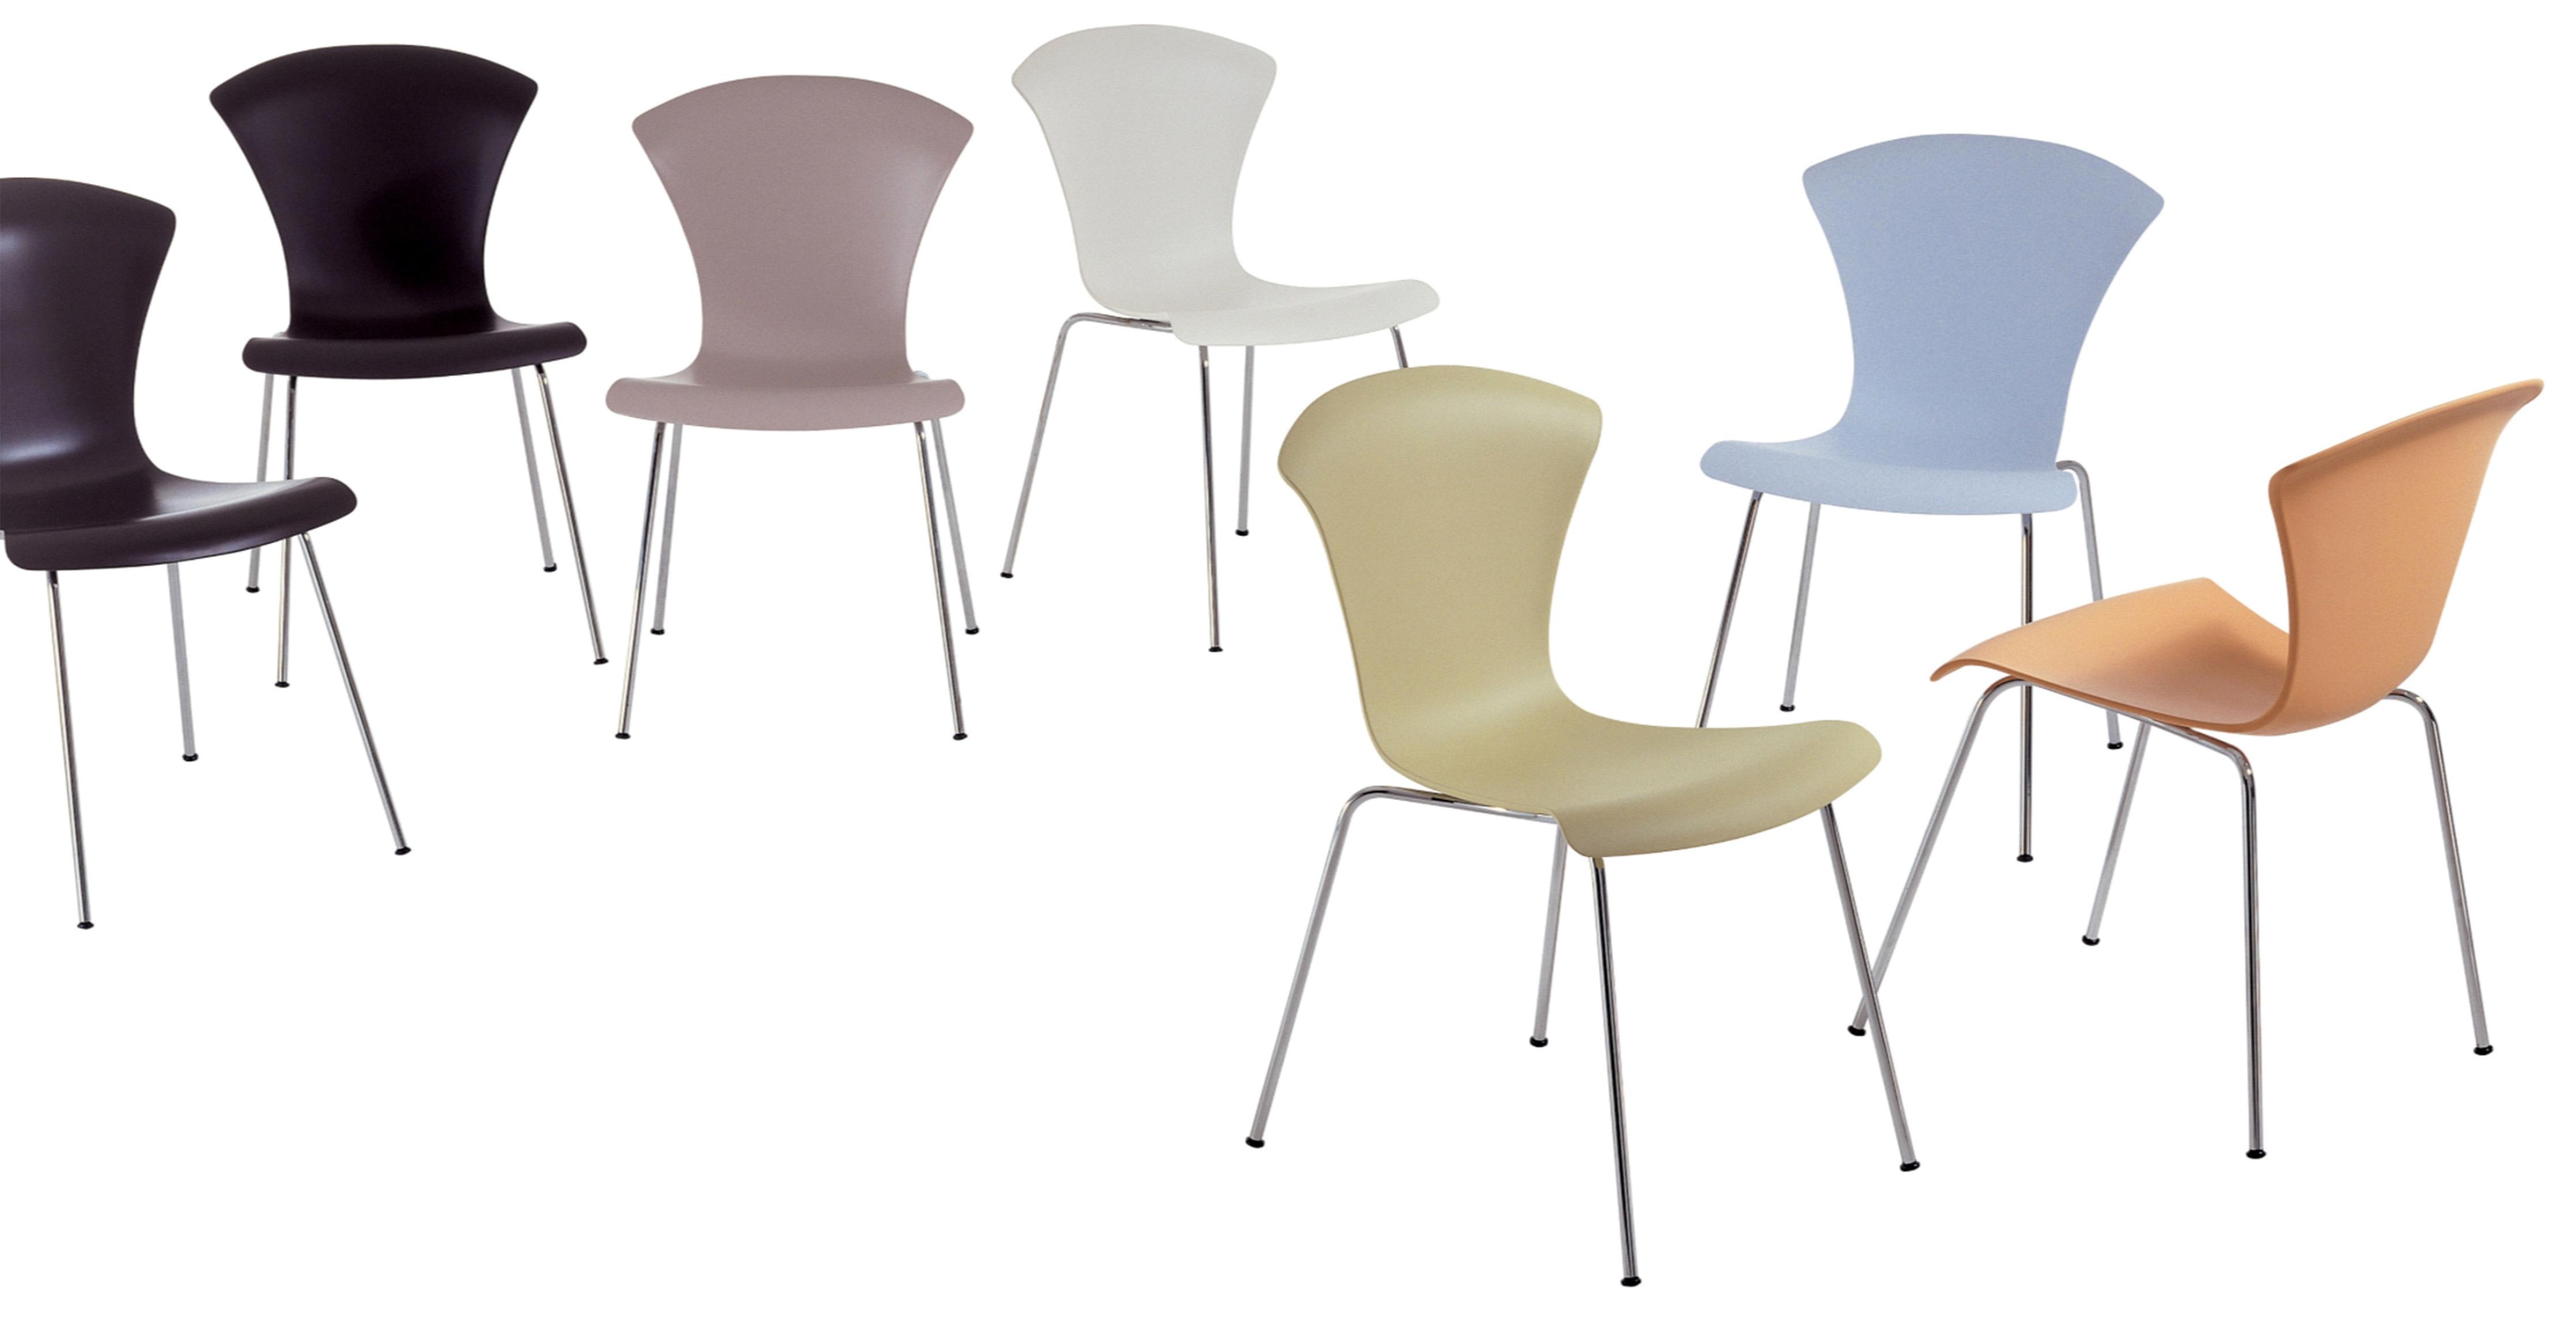 Sedie kartell scontata del 46 vico magistretti sedie a for Sedie design kartell